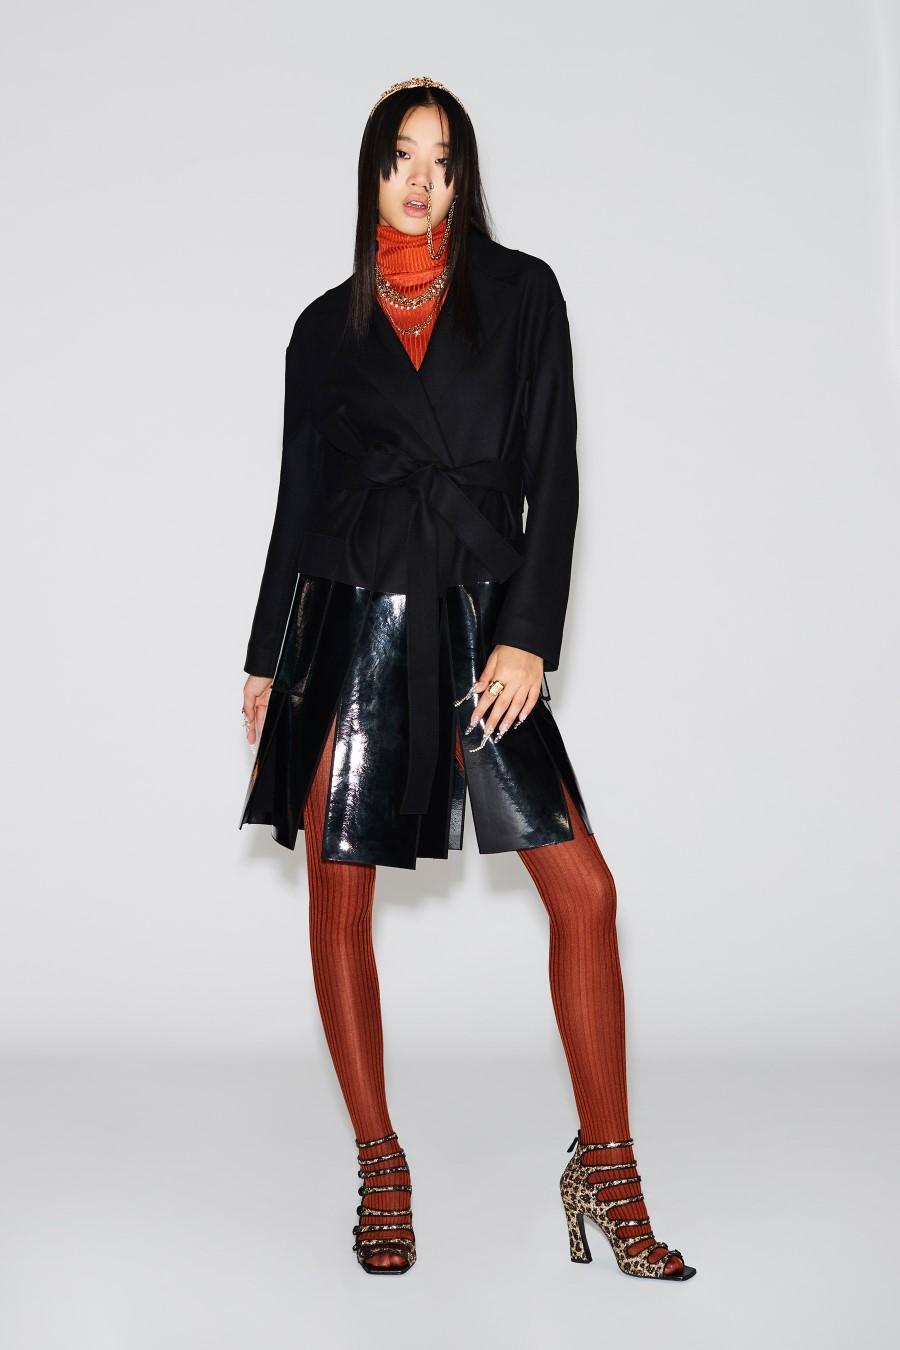 Dsquared2 Fall Winter 2021 - Milan Fashion Week